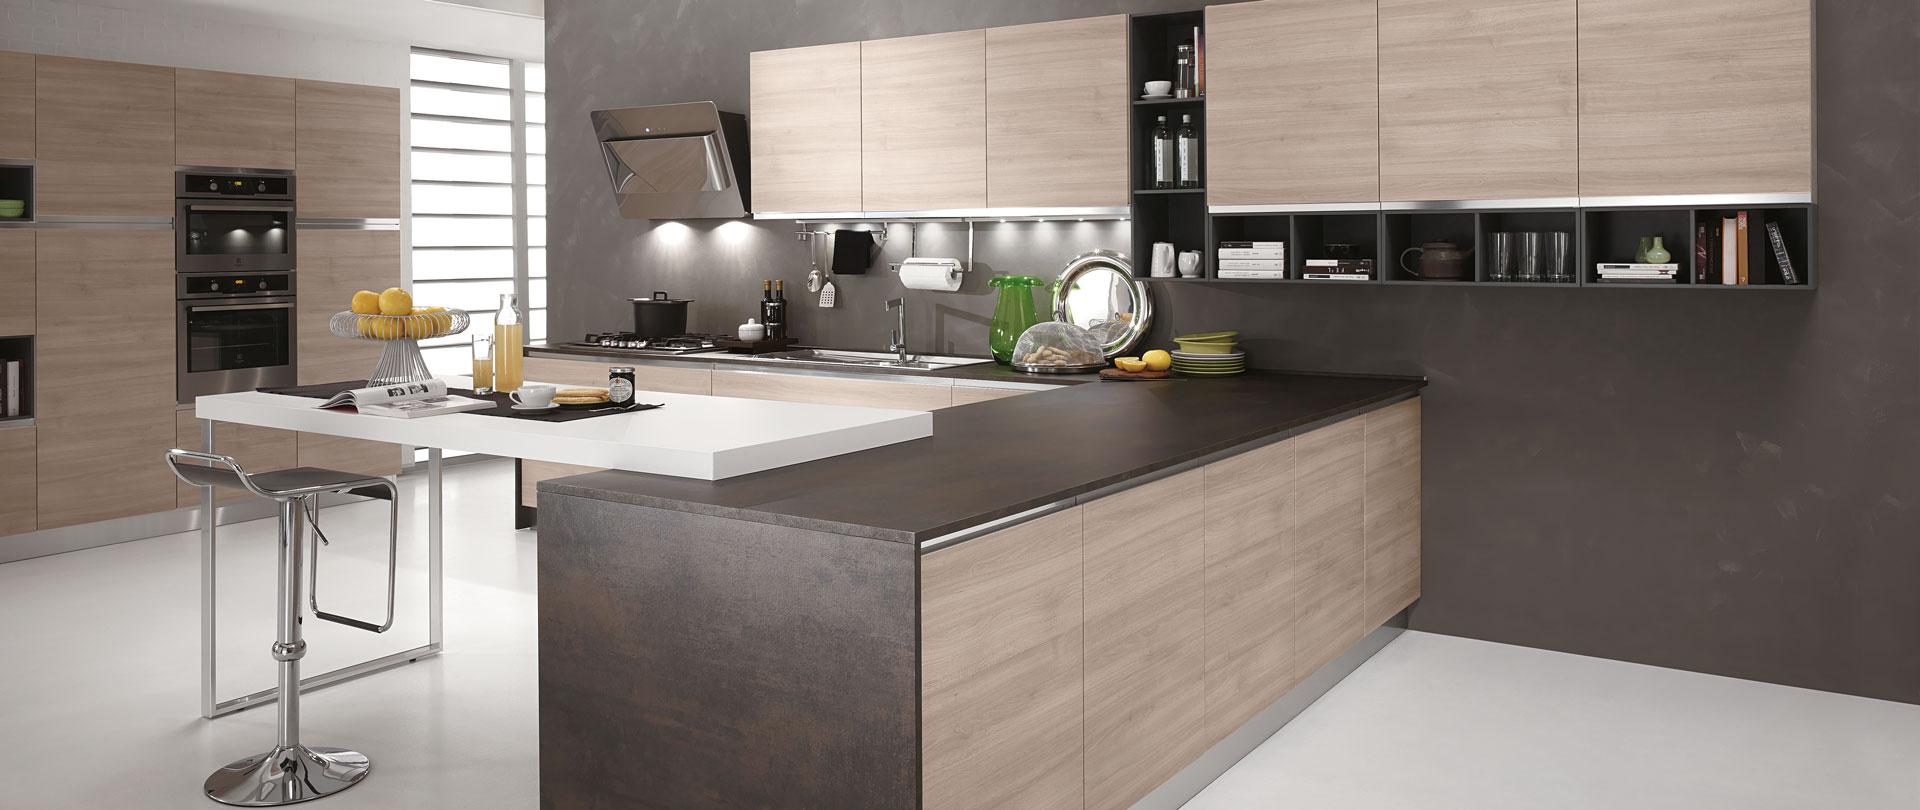 03-cucina-moderna-newmeg-tranche-naturale